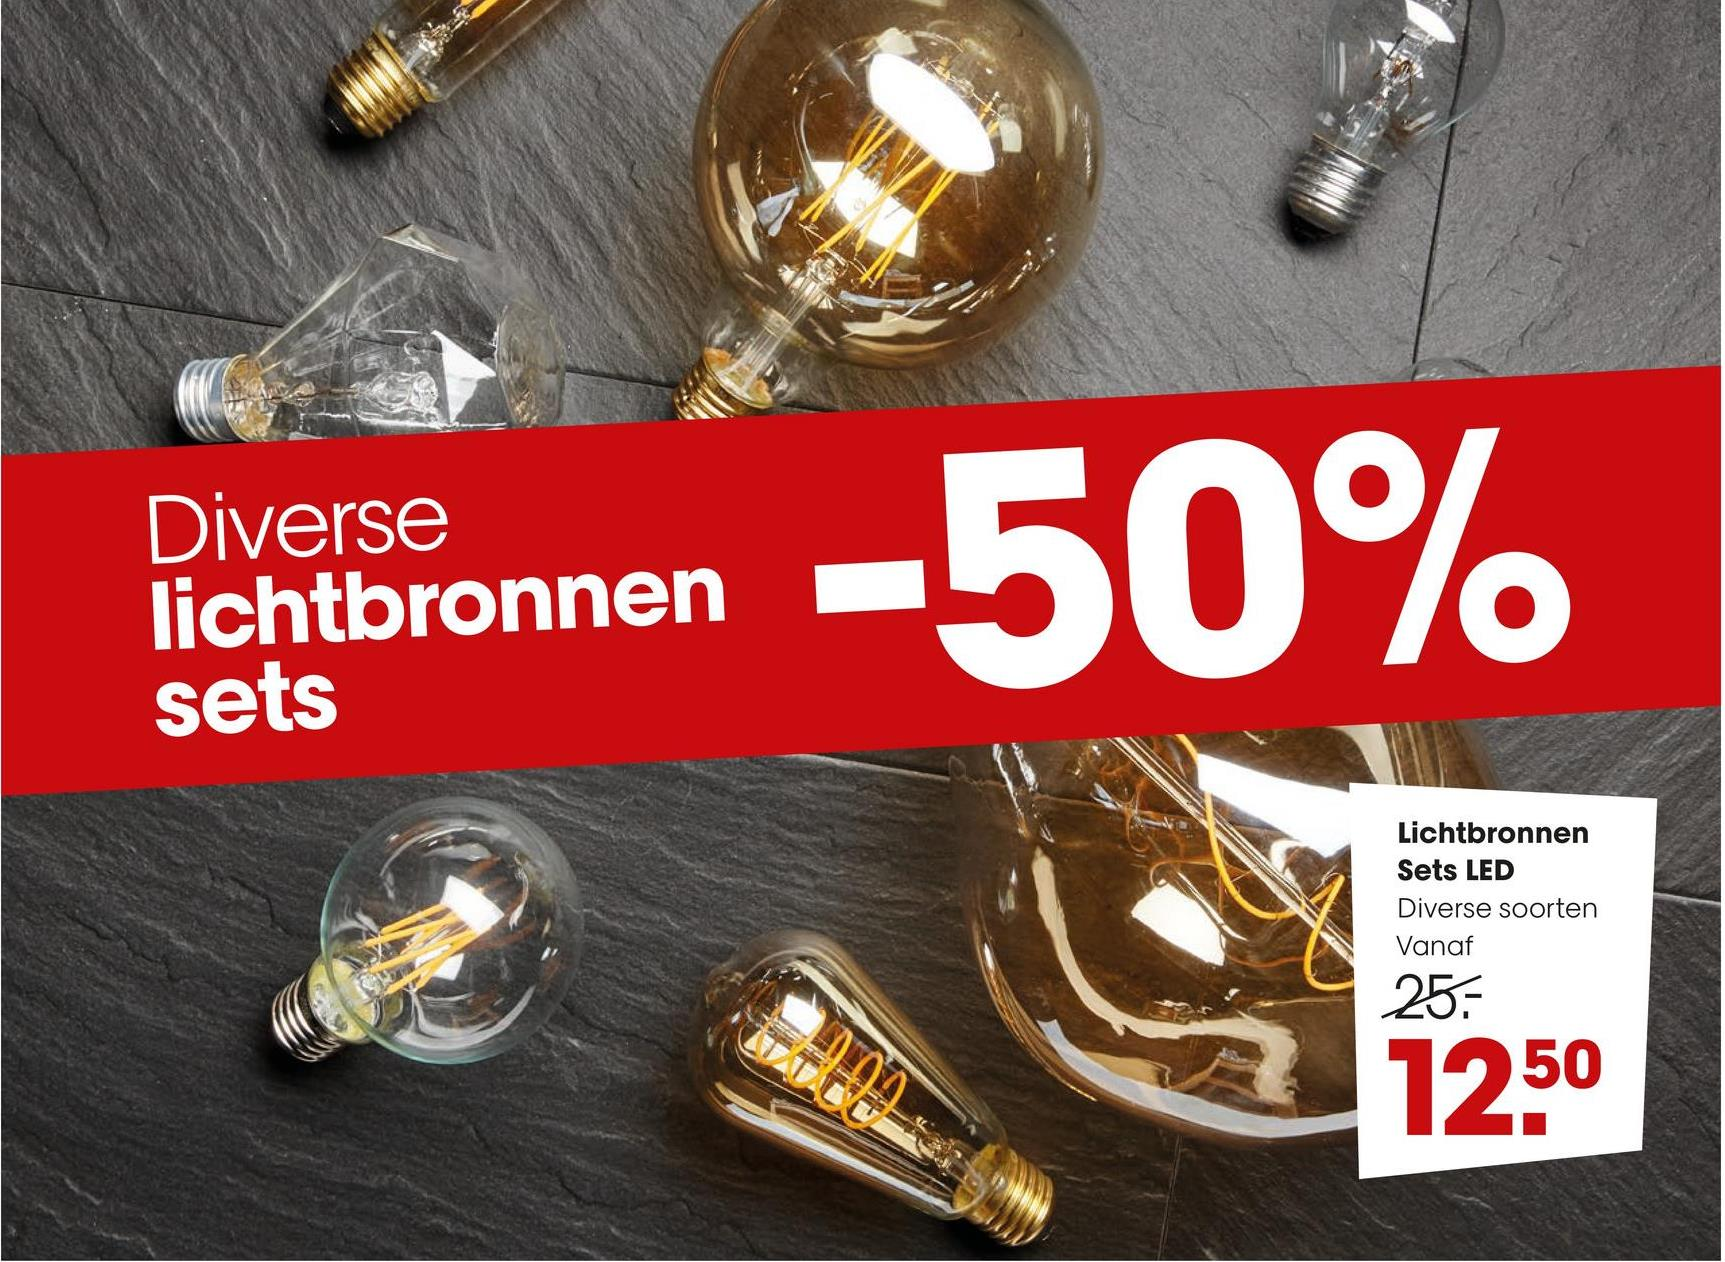 Diverse lichtbronnen sets Remainonnan -50% Lichtbronnen Sets LED Diverse soorten Vanaf 25: 1250